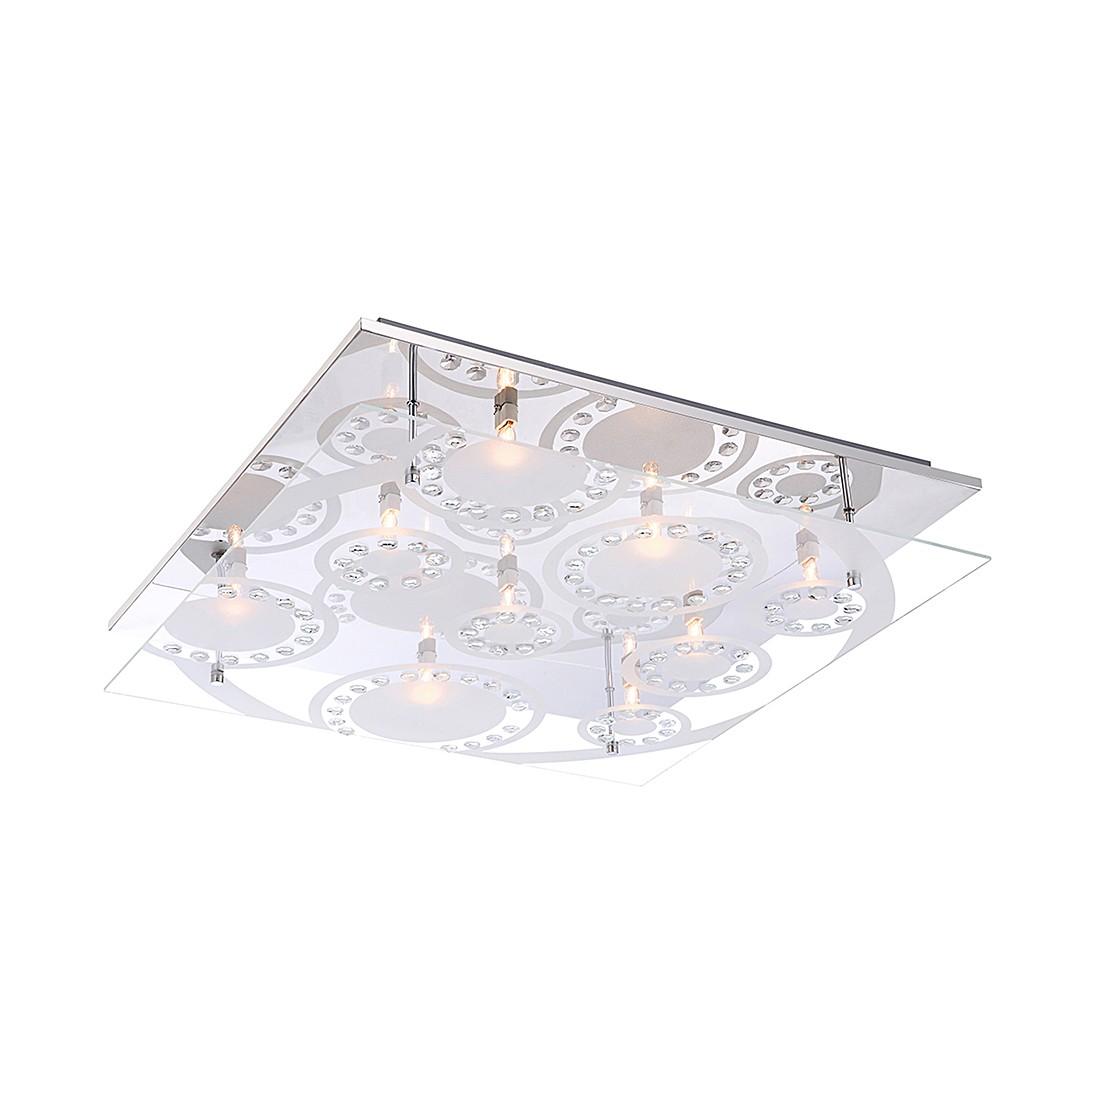 EEK A++, Deckenleuchte Dianne I - Metall - Silber - 9-flammig, Globo Lighting